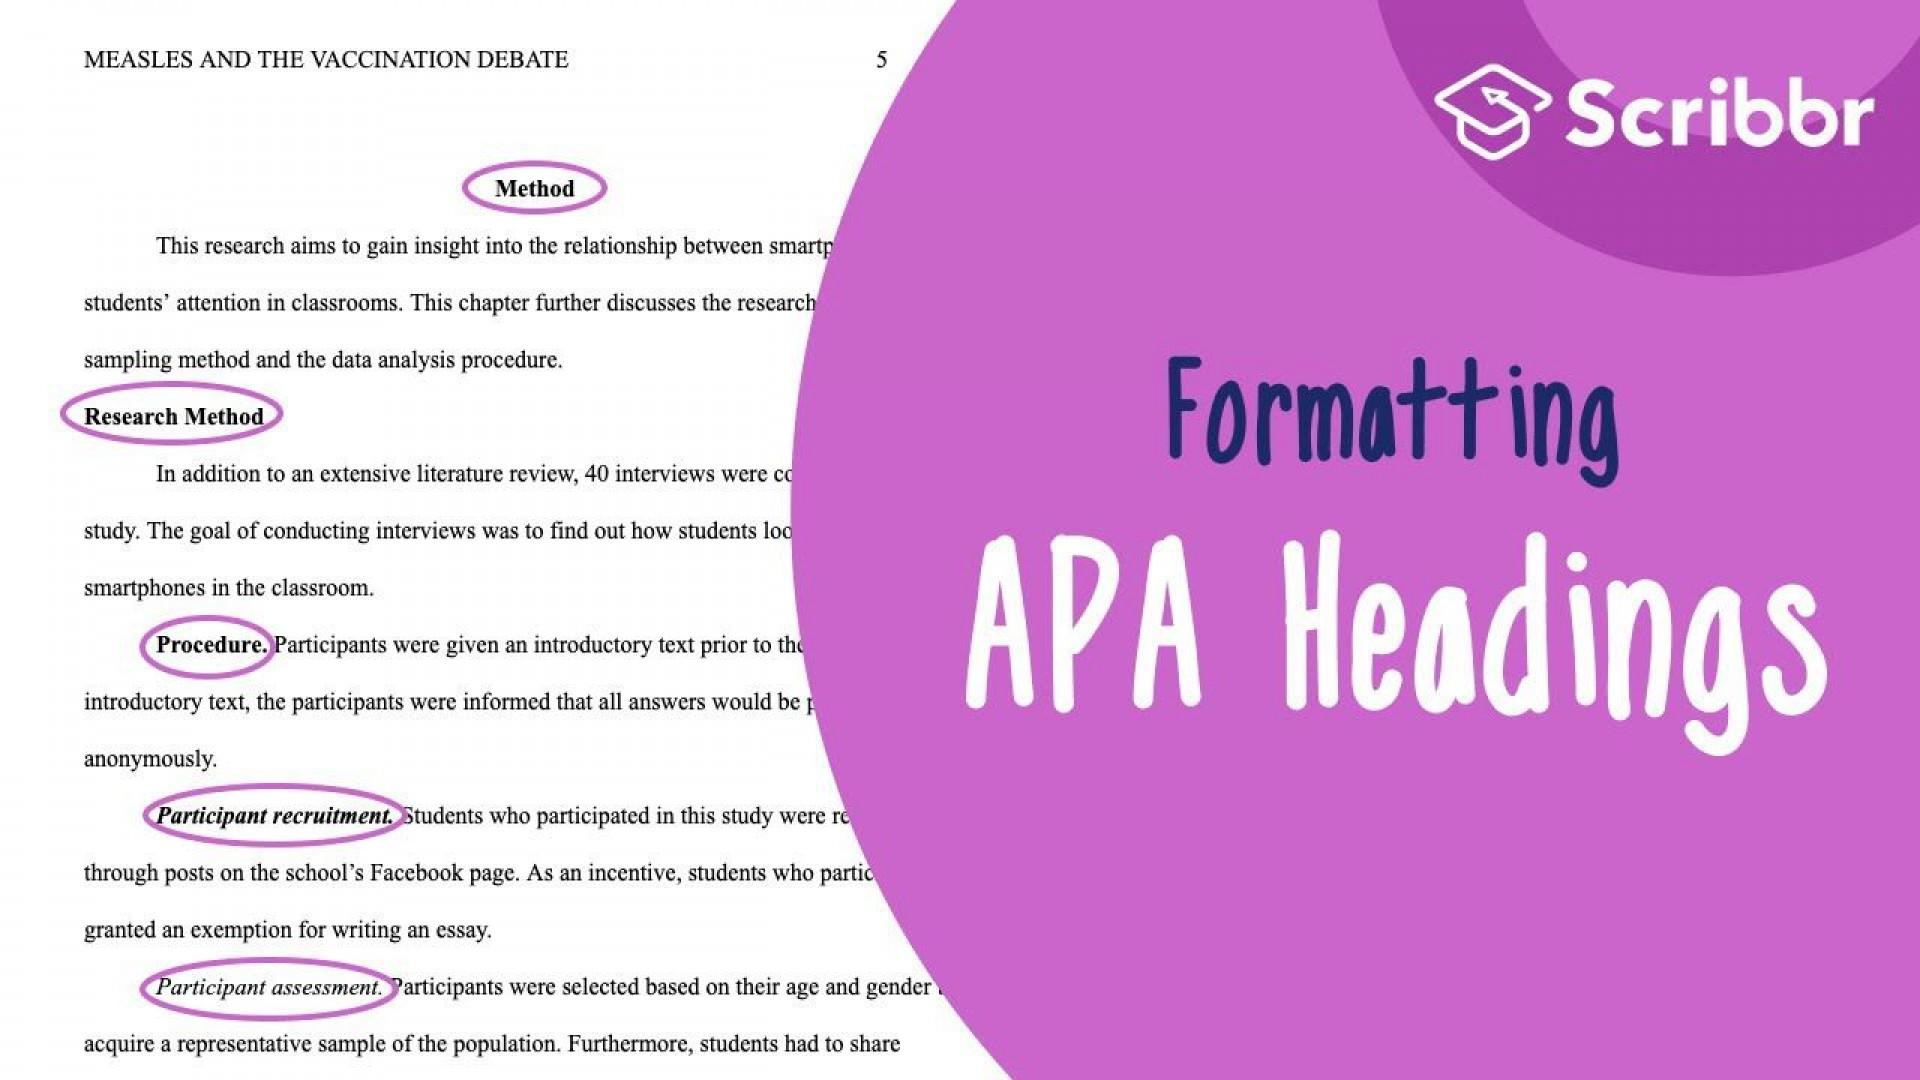 001 Sensational Literature Review Sample Apa 6th Edition High Def  Format1920